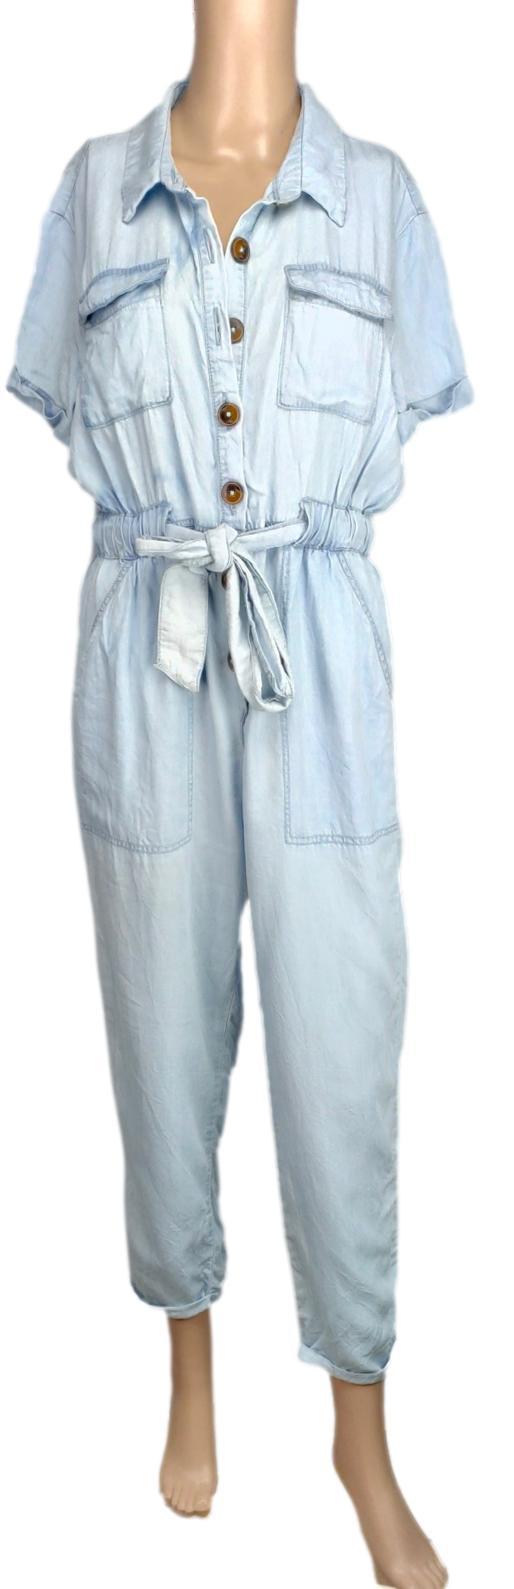 Combi-pantalon Denim&Co - Taille 36